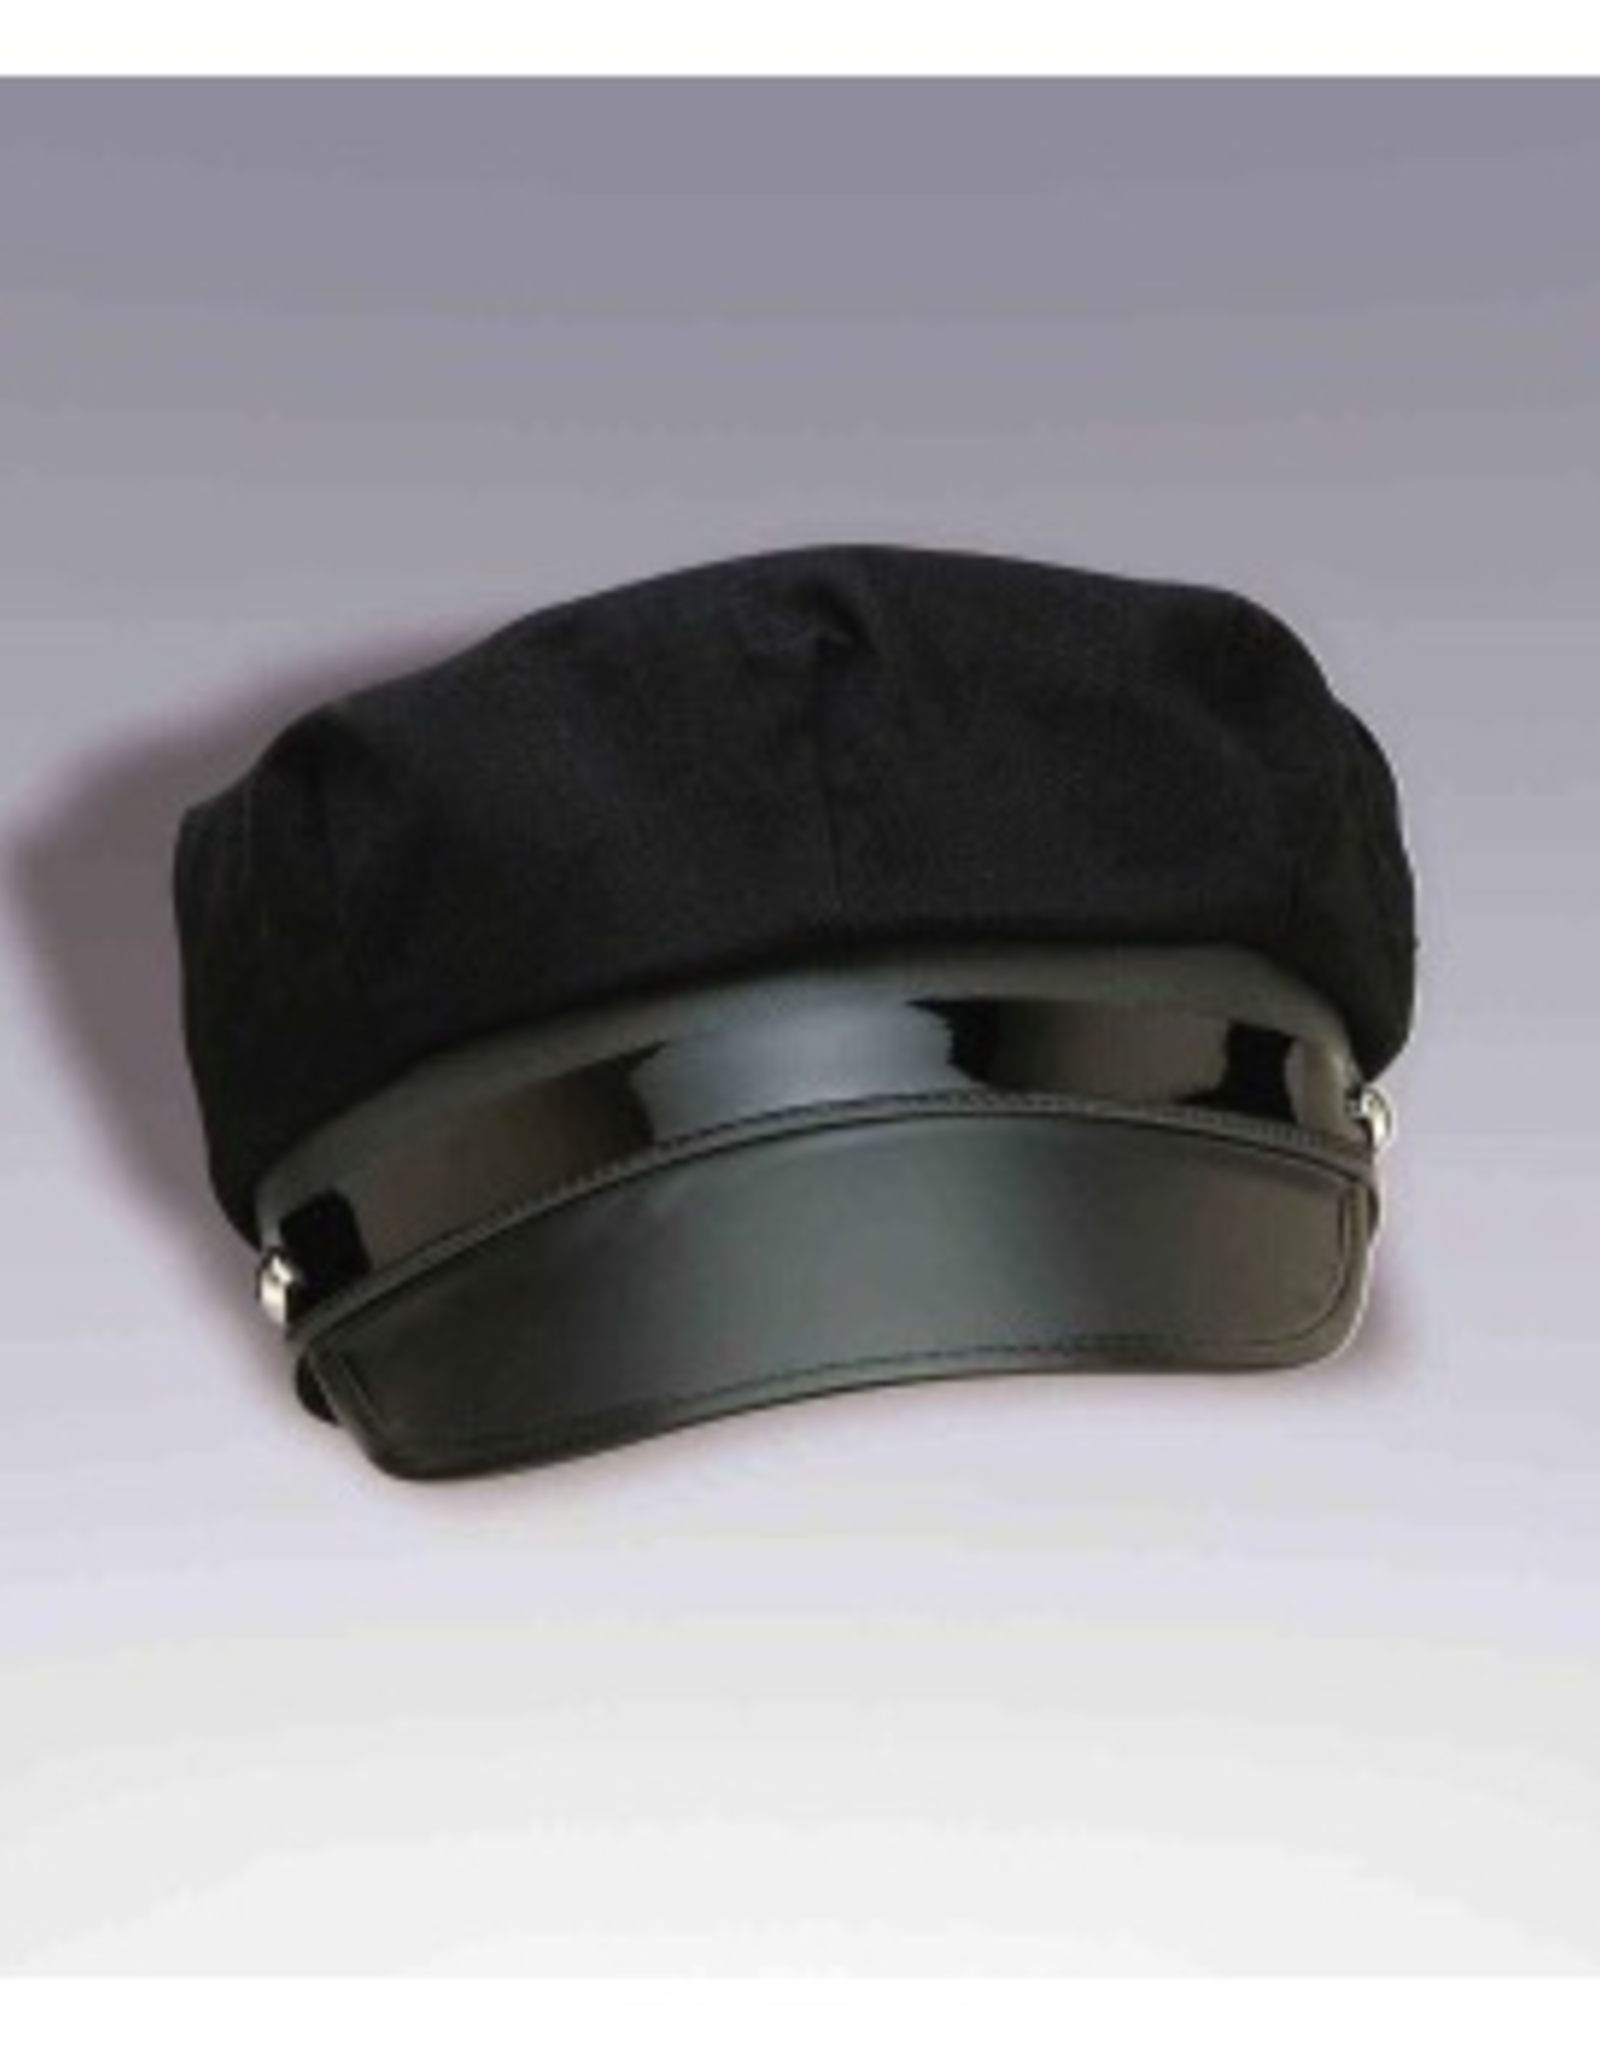 HAT-CHAUFFEUR, BLACK